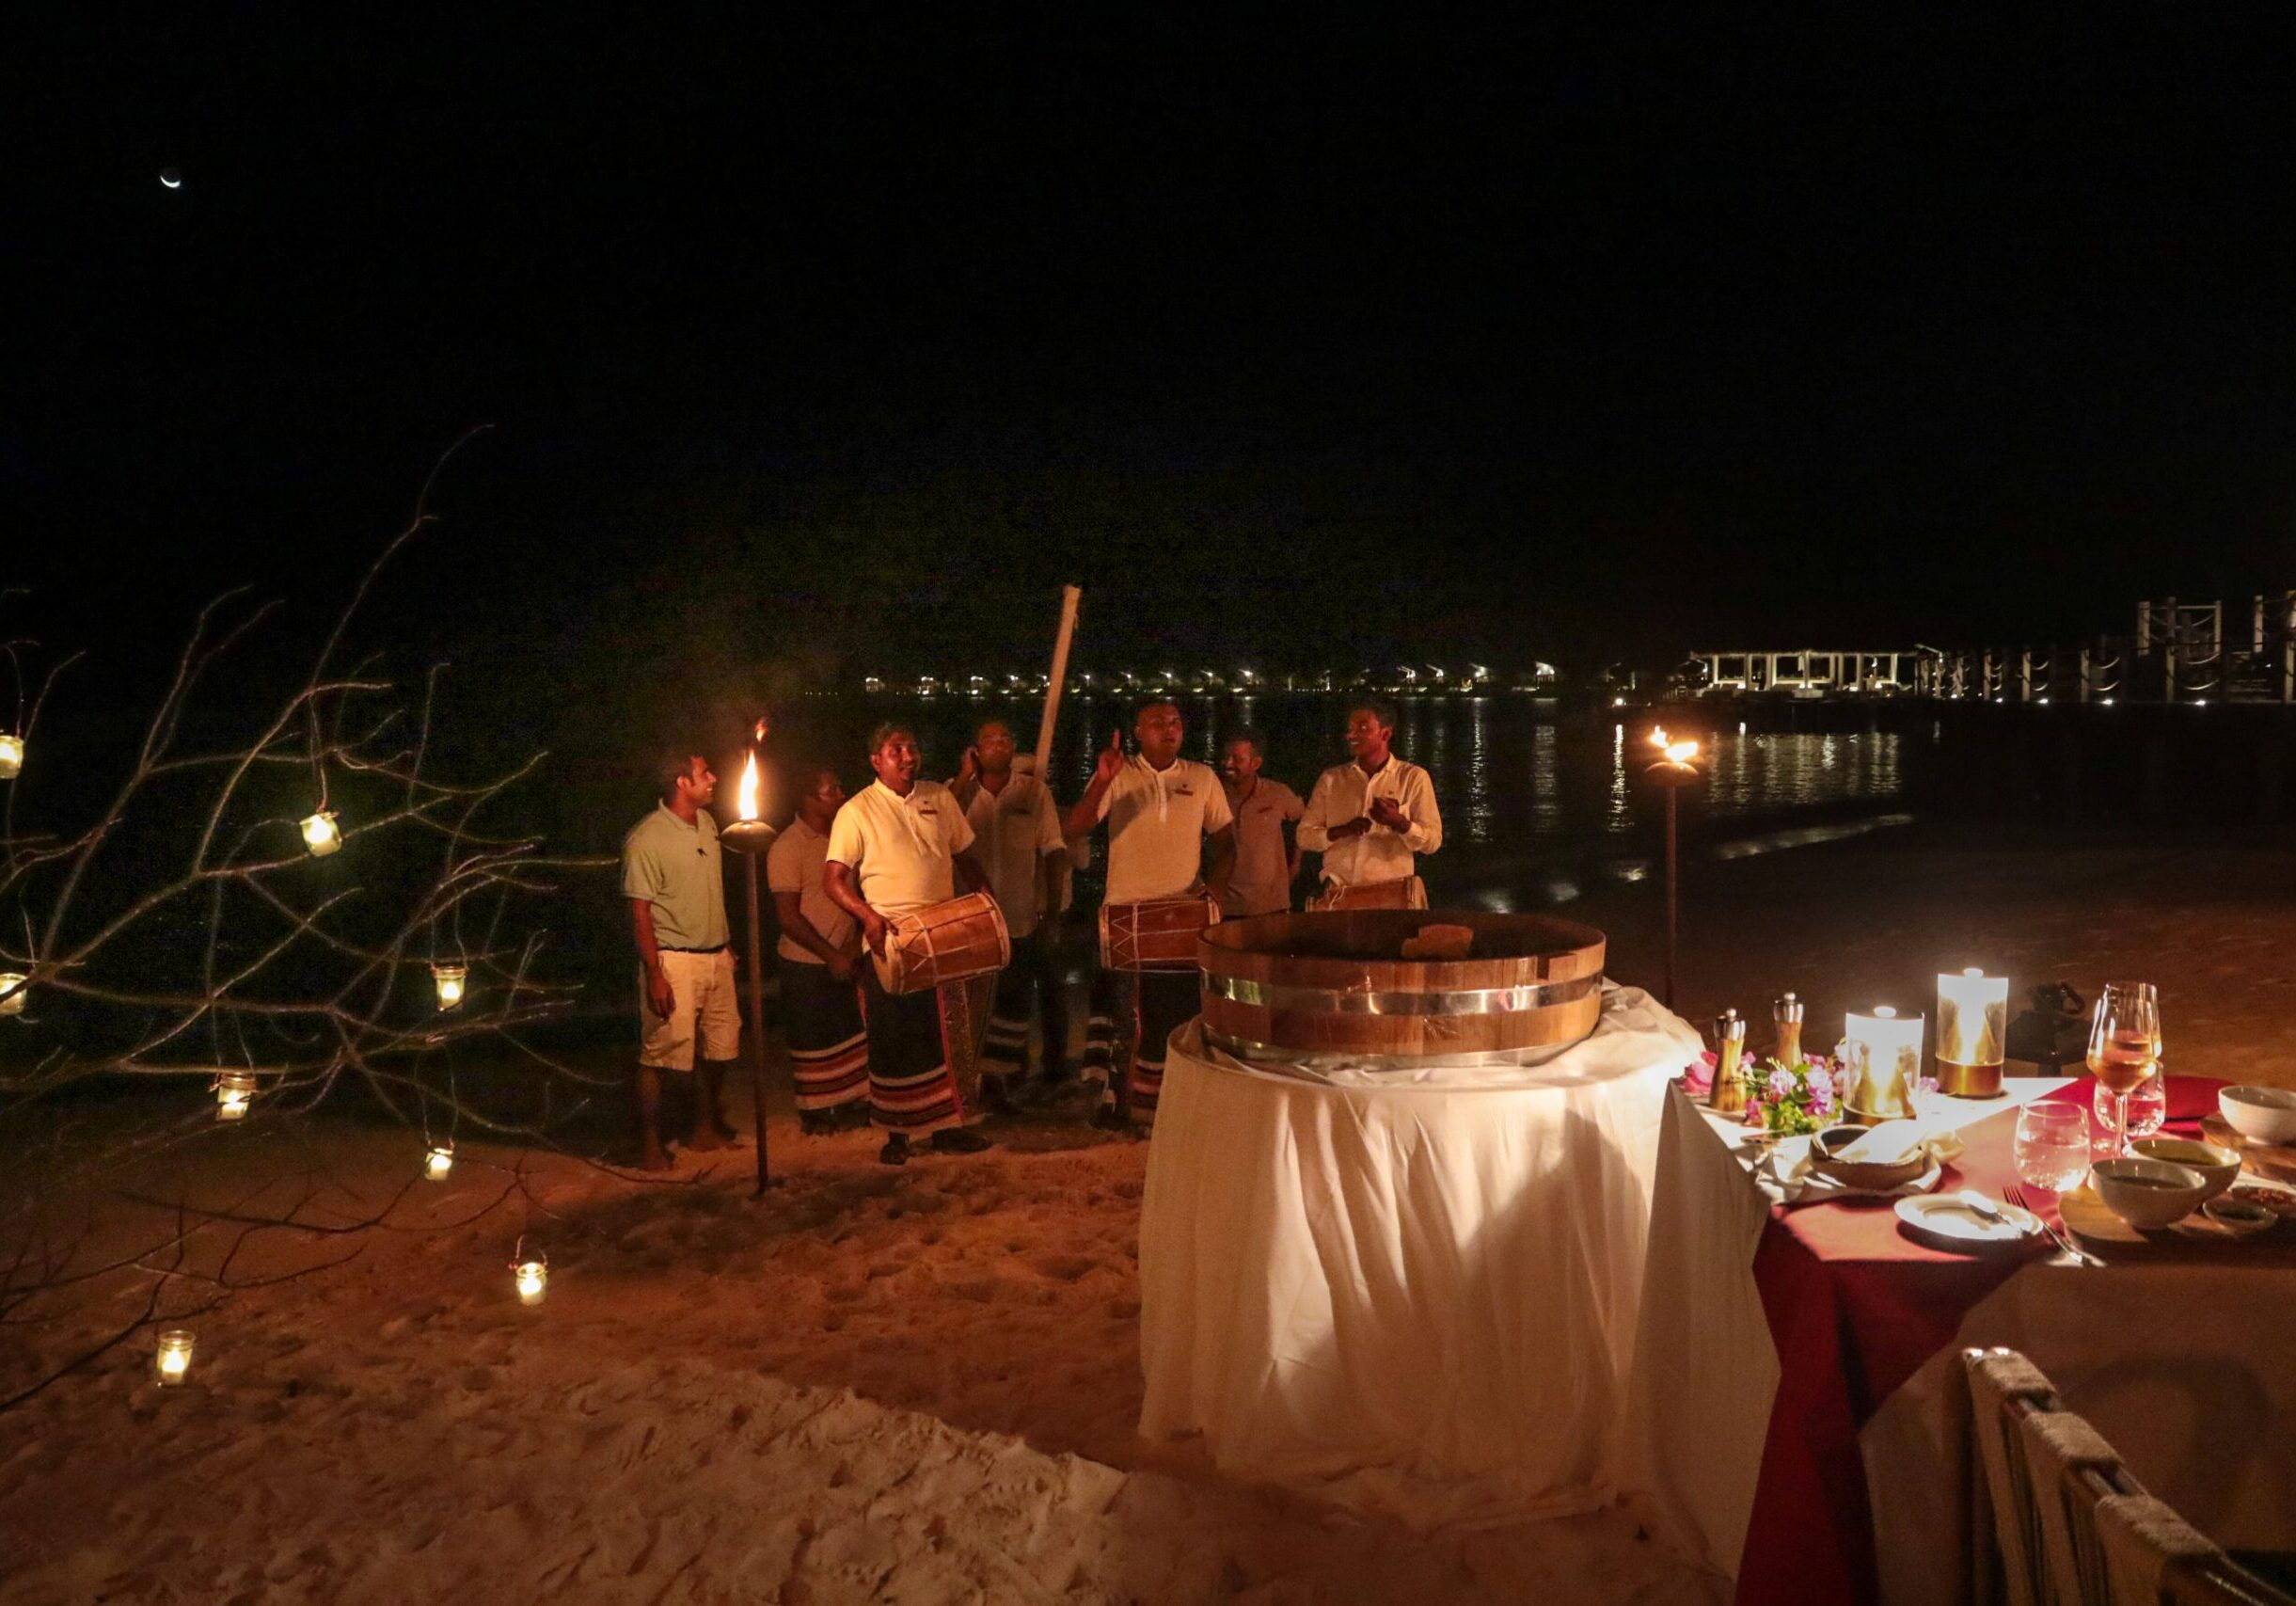 JW Marriott Maldives Strand Dinner